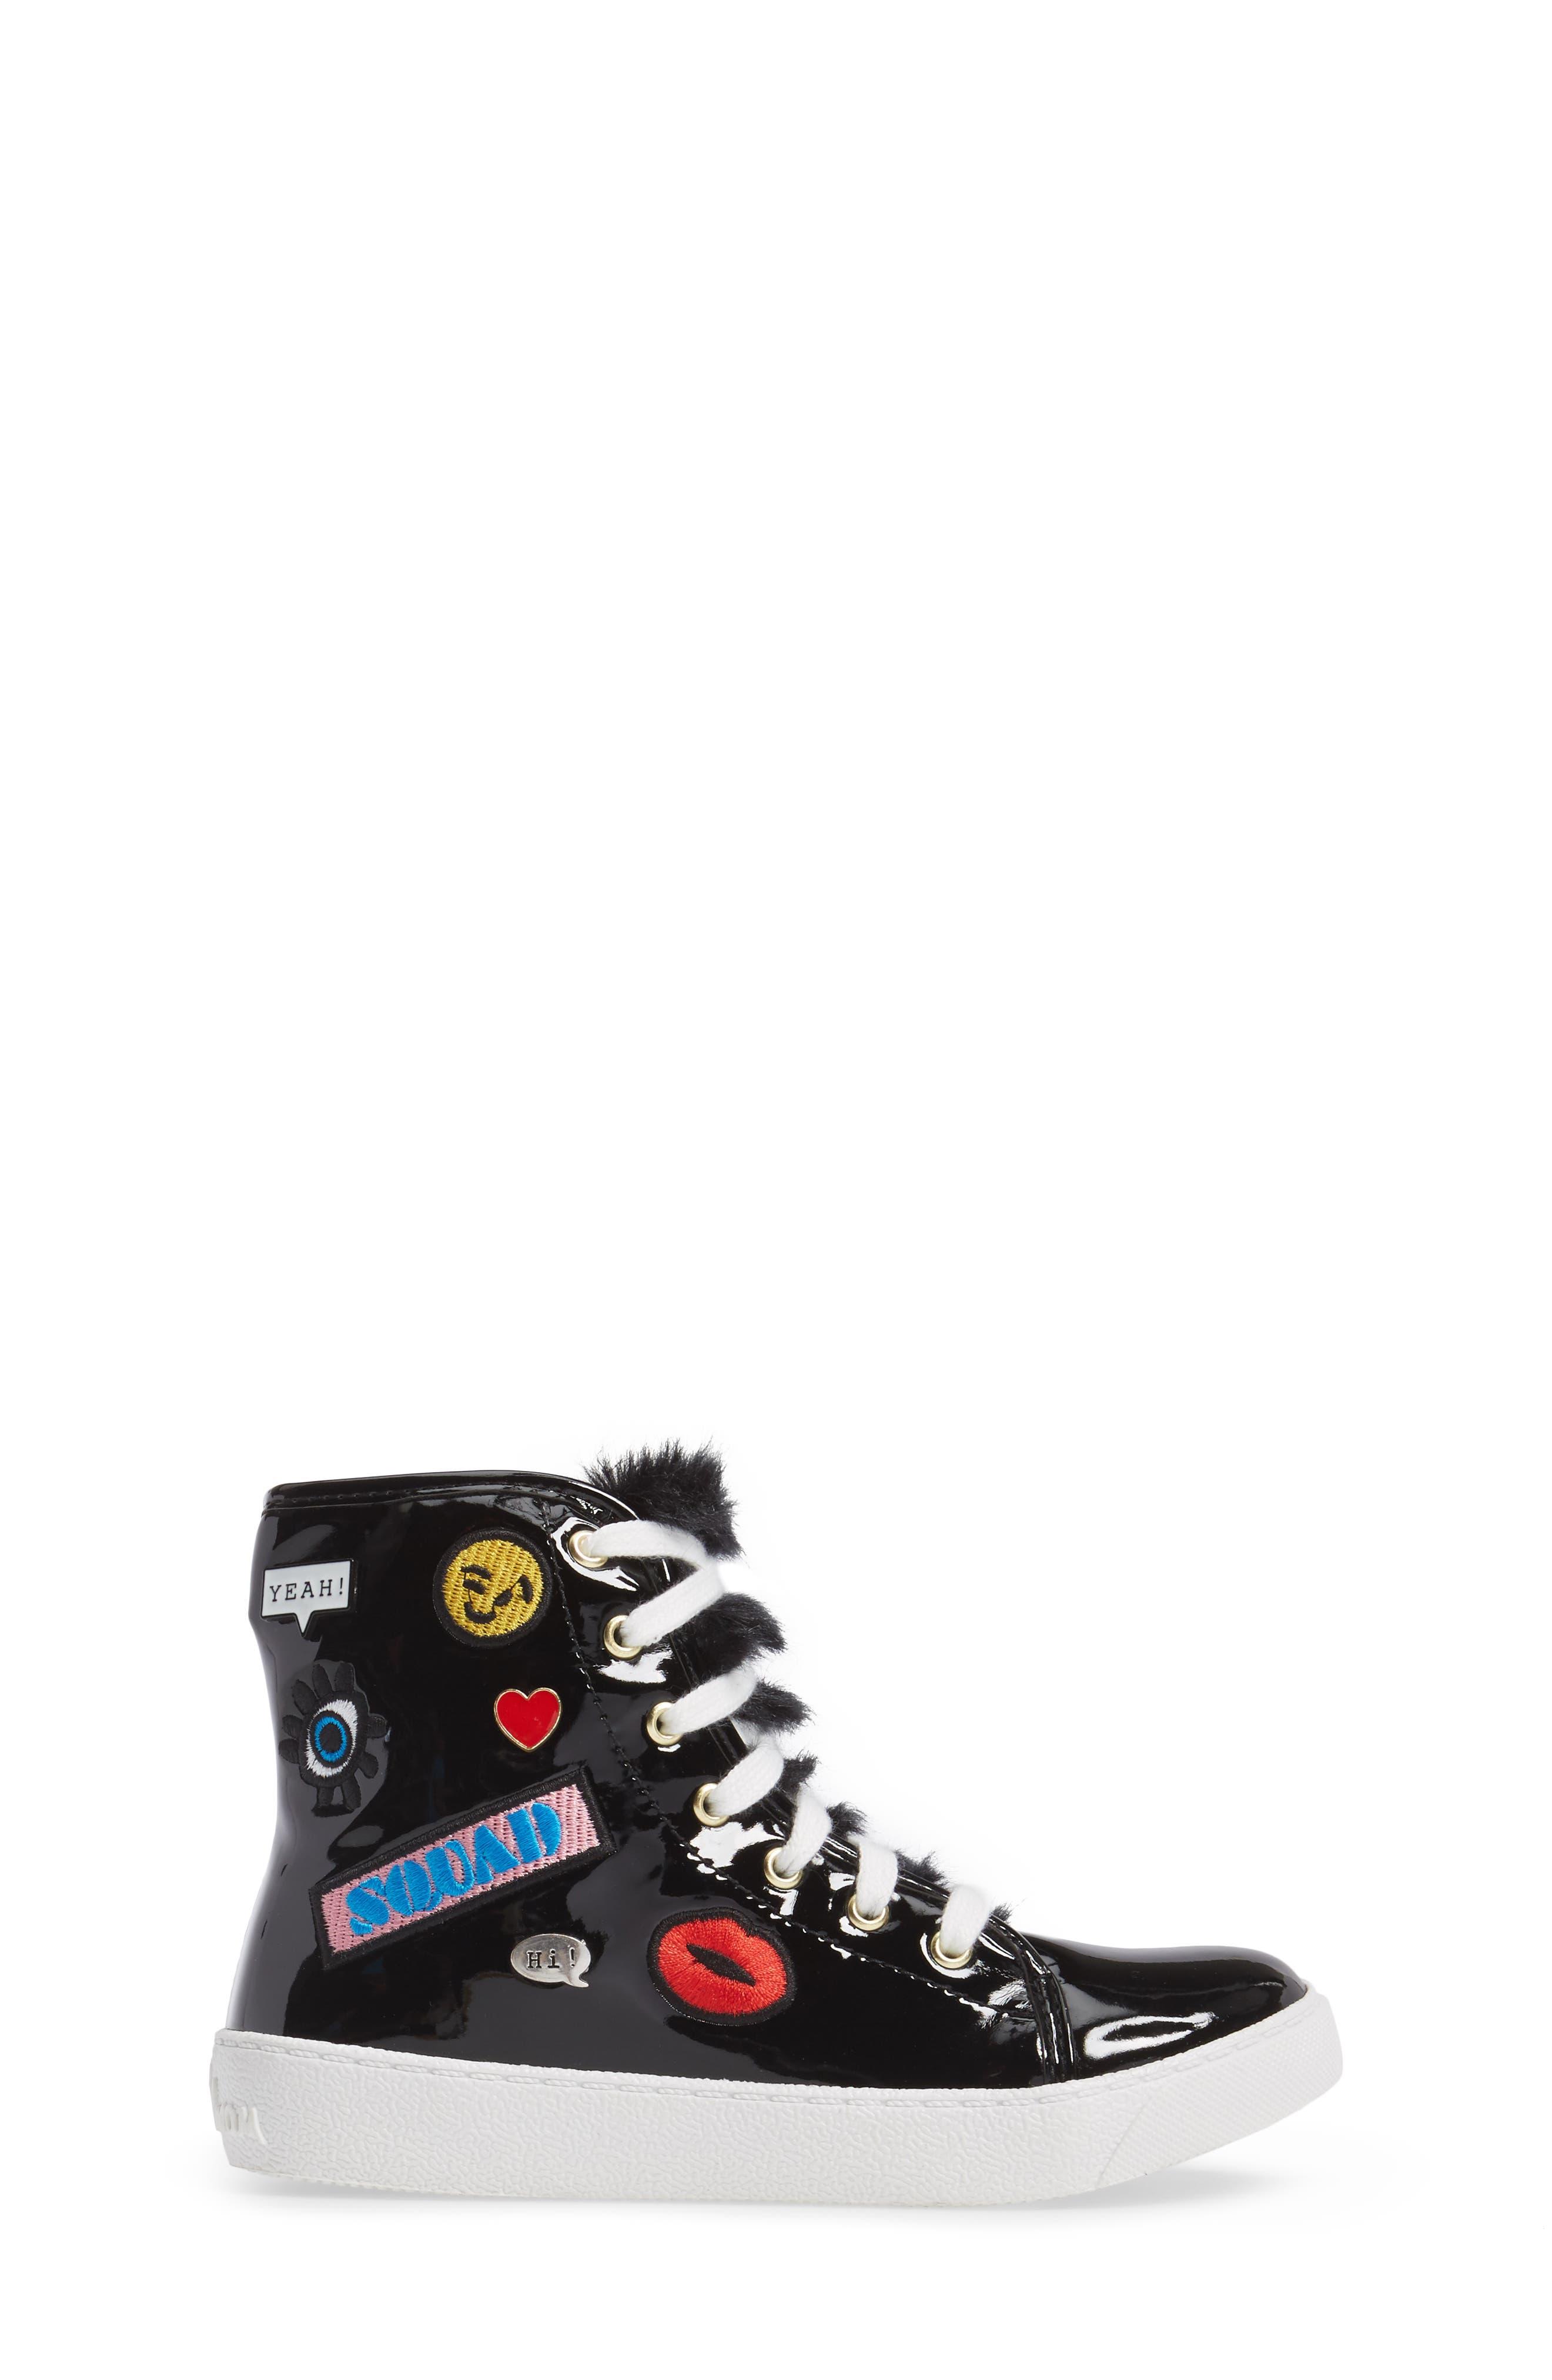 Harriet Heidi High-Top Sneaker,                             Alternate thumbnail 3, color,                             001